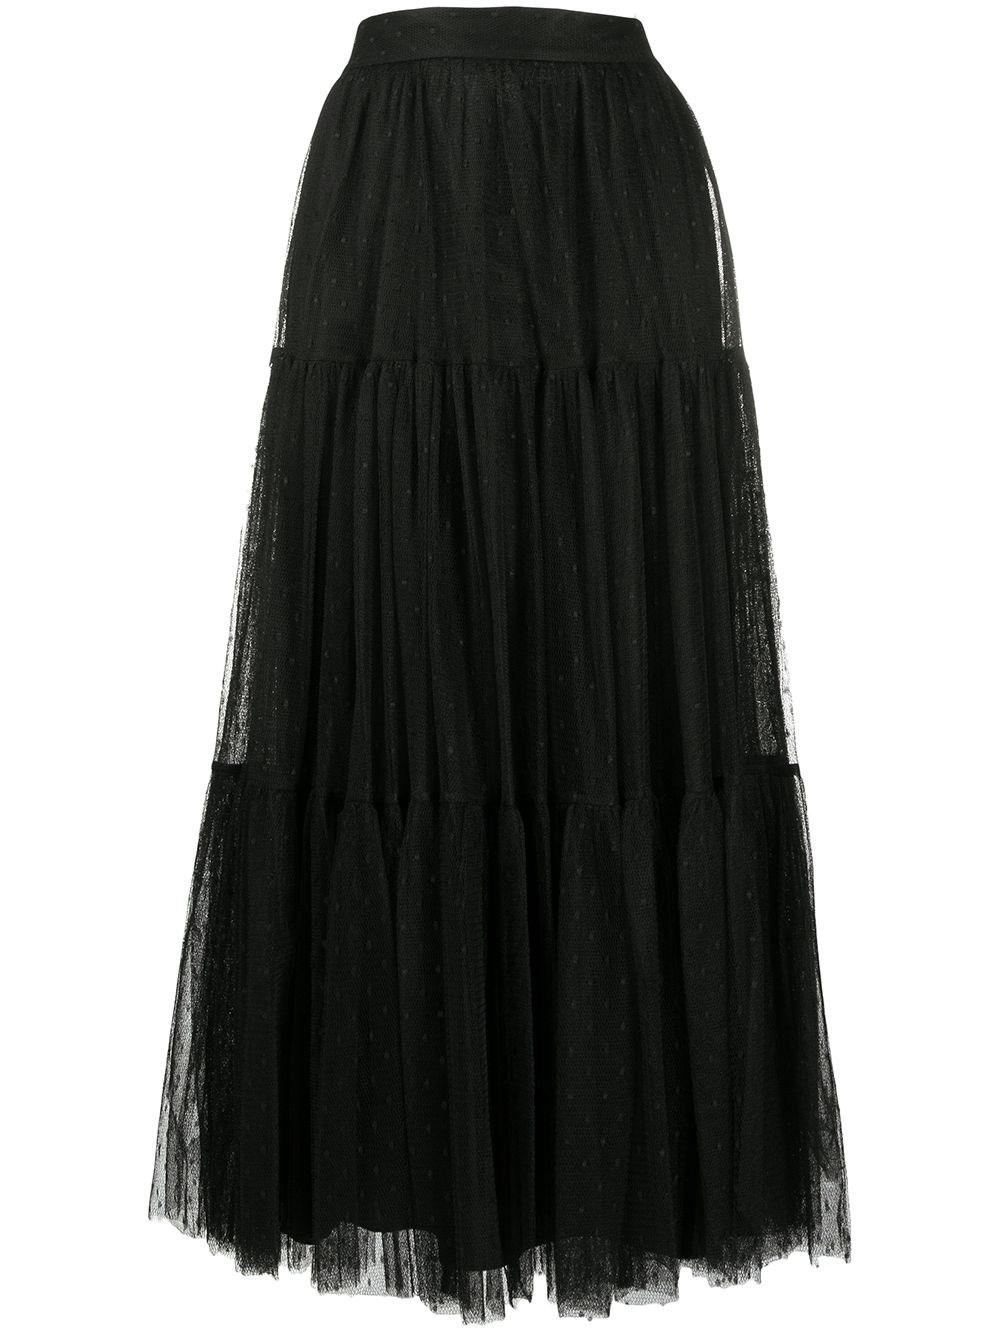 REDVALENTINO Point D'esprit Tulle Skirt